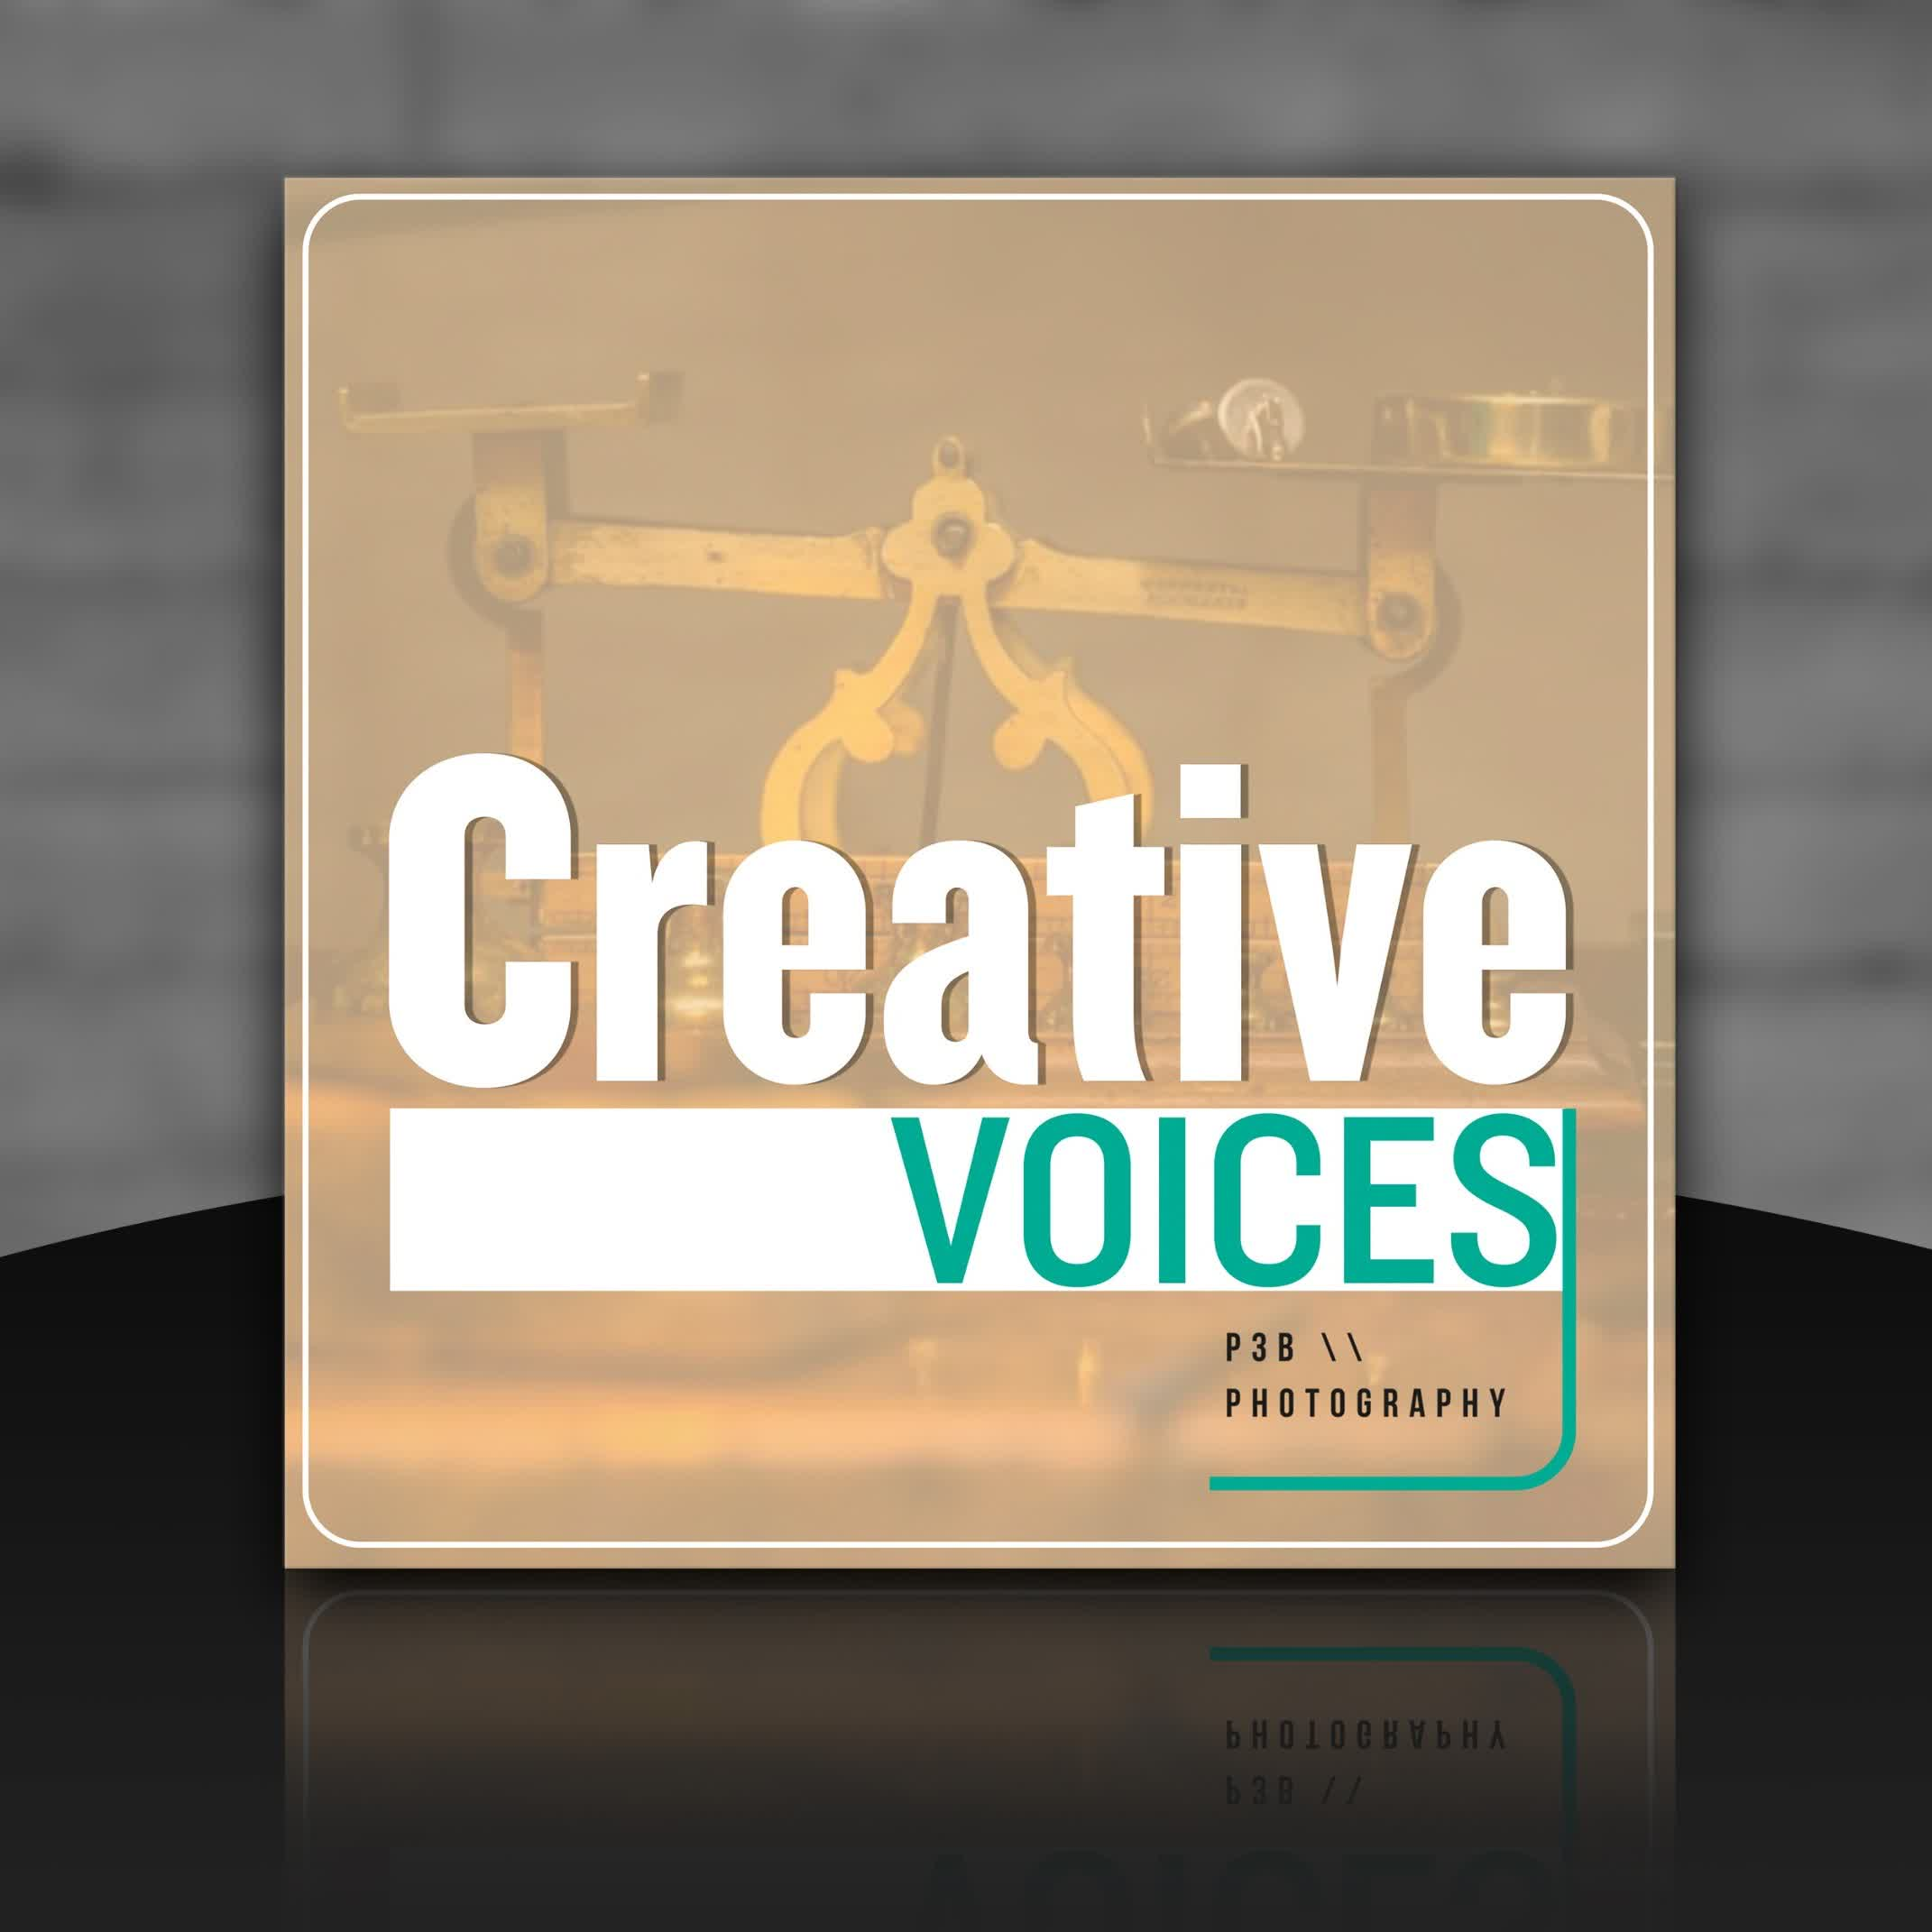 Creative voices